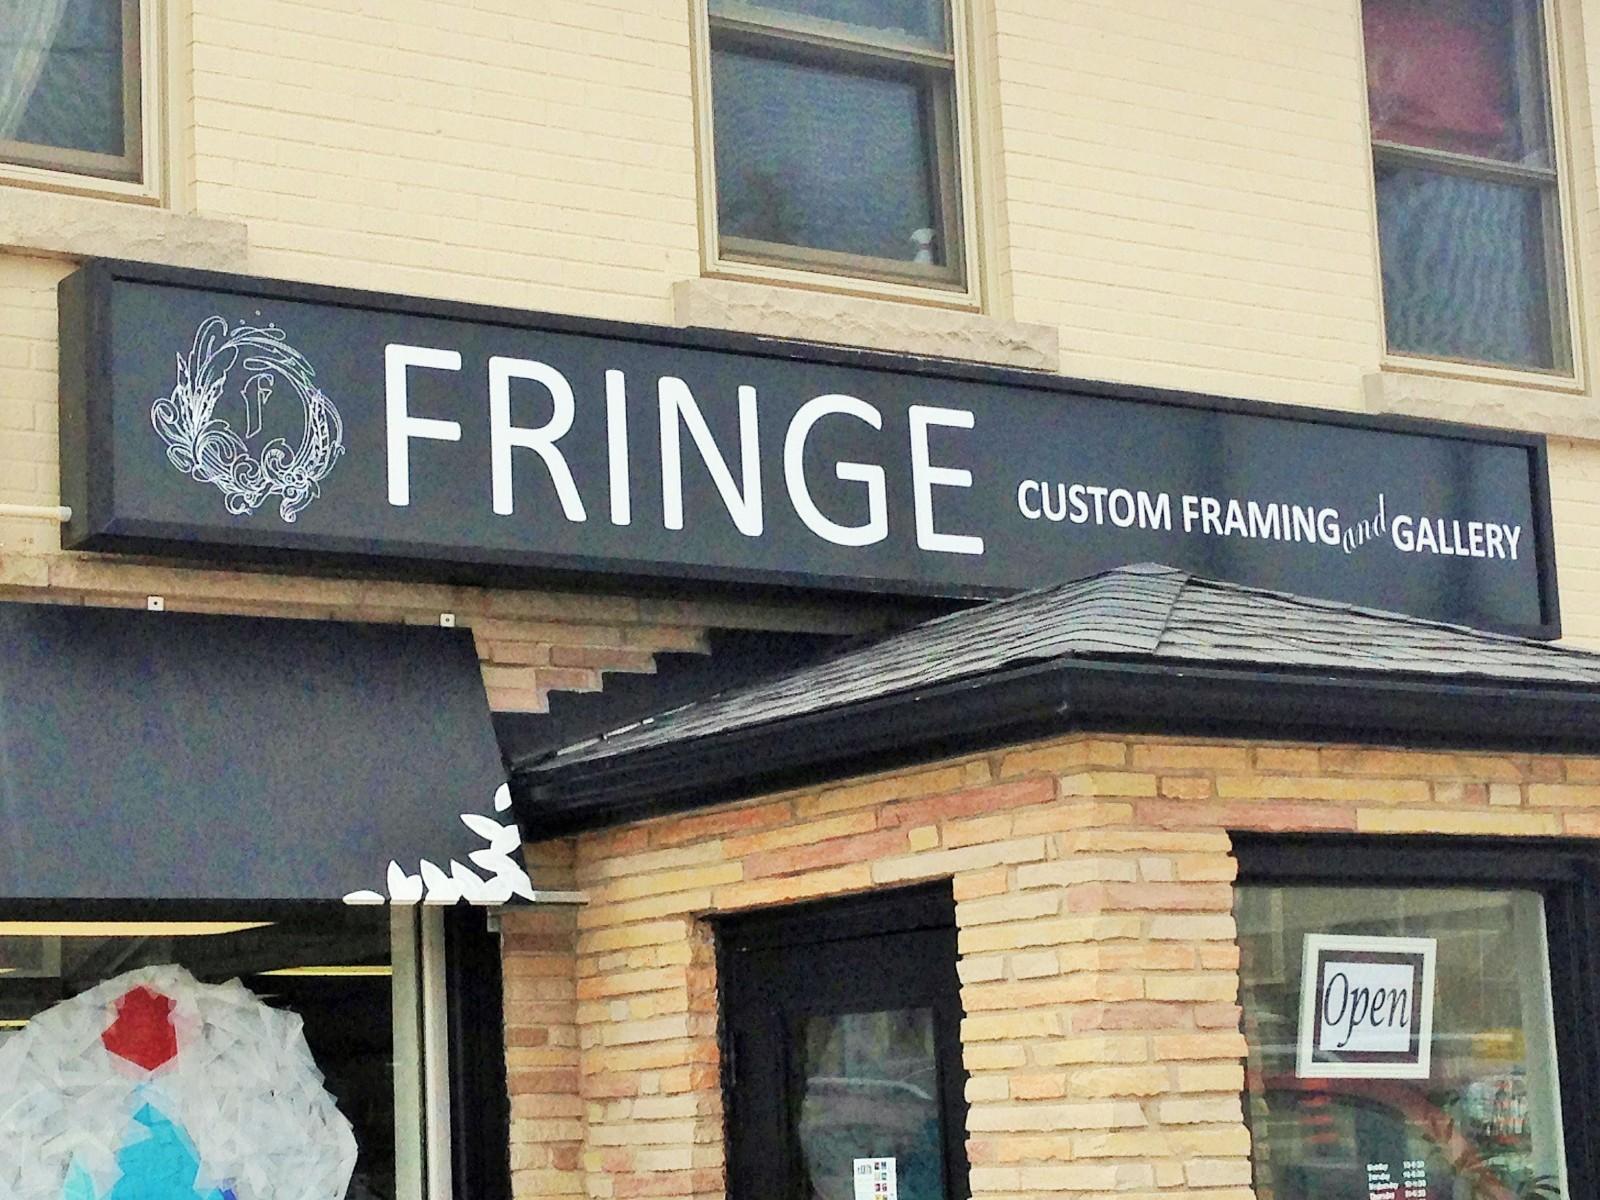 Fringe Art Gallery gives back for eARTh Day